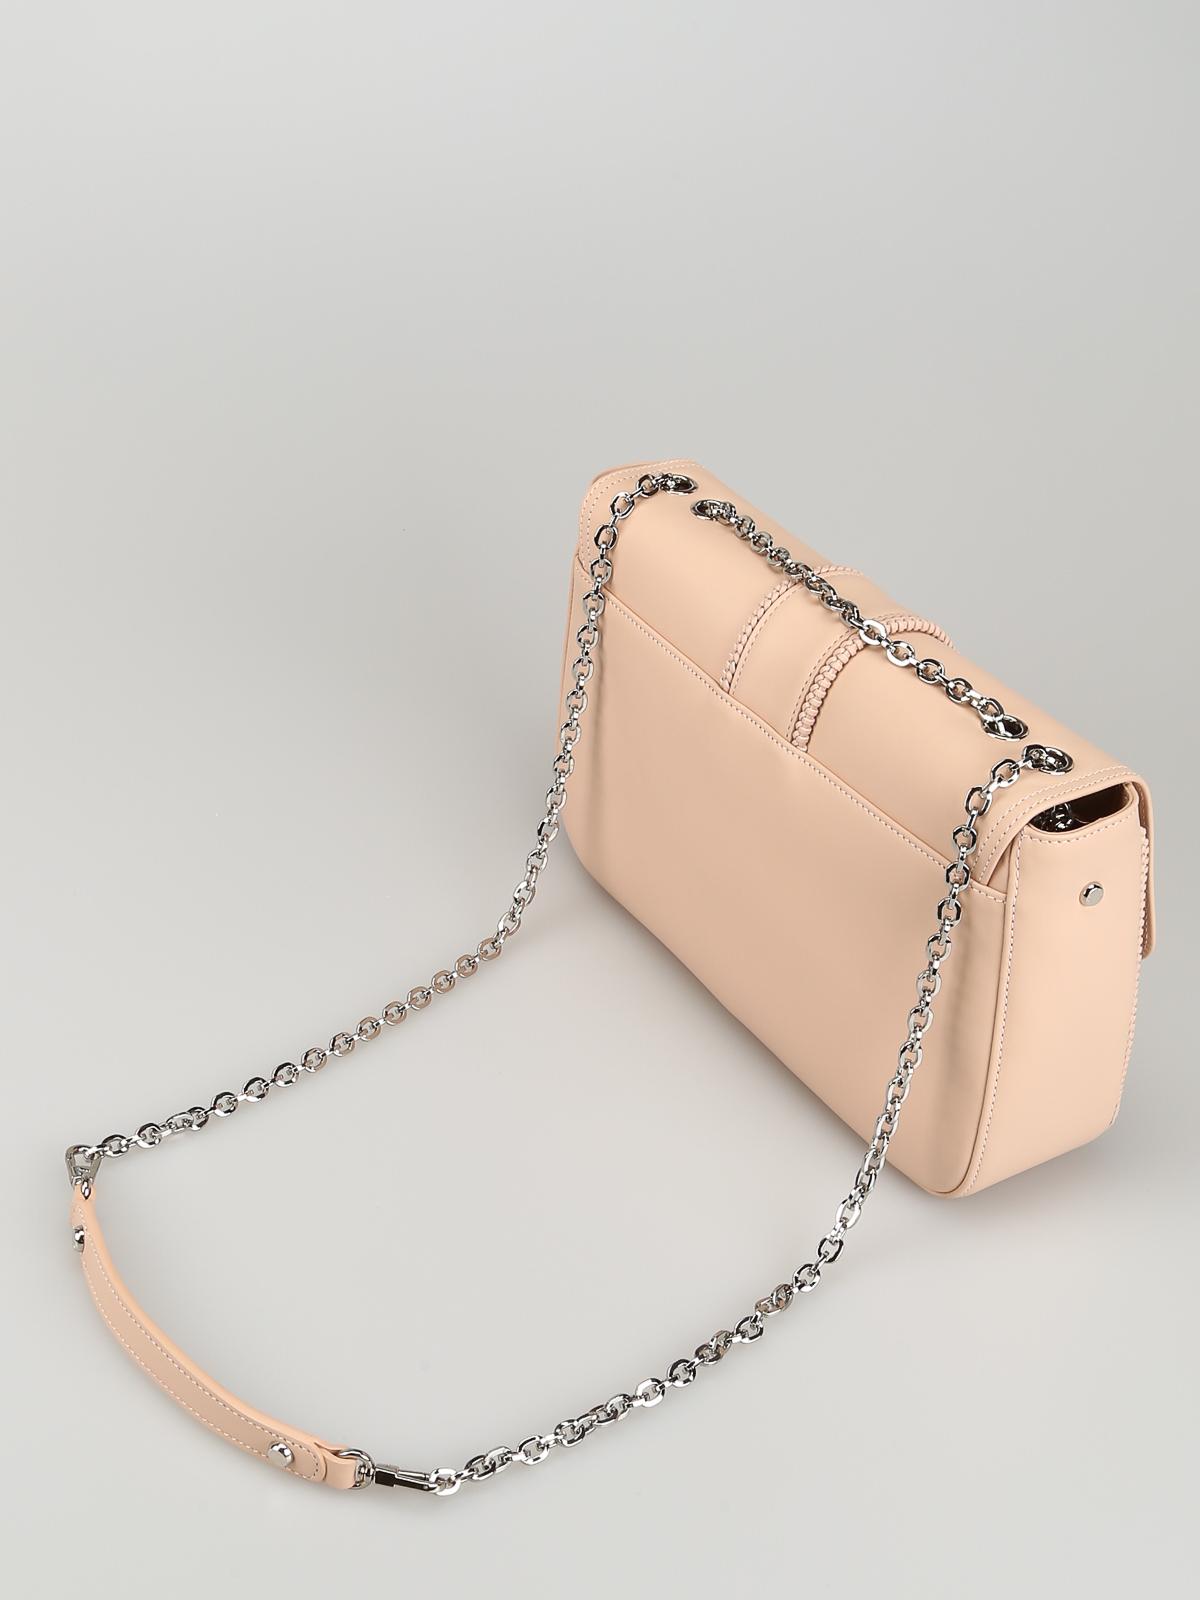 Longchamp - Amazone leather cross body bag - کیف کج - 1358930507